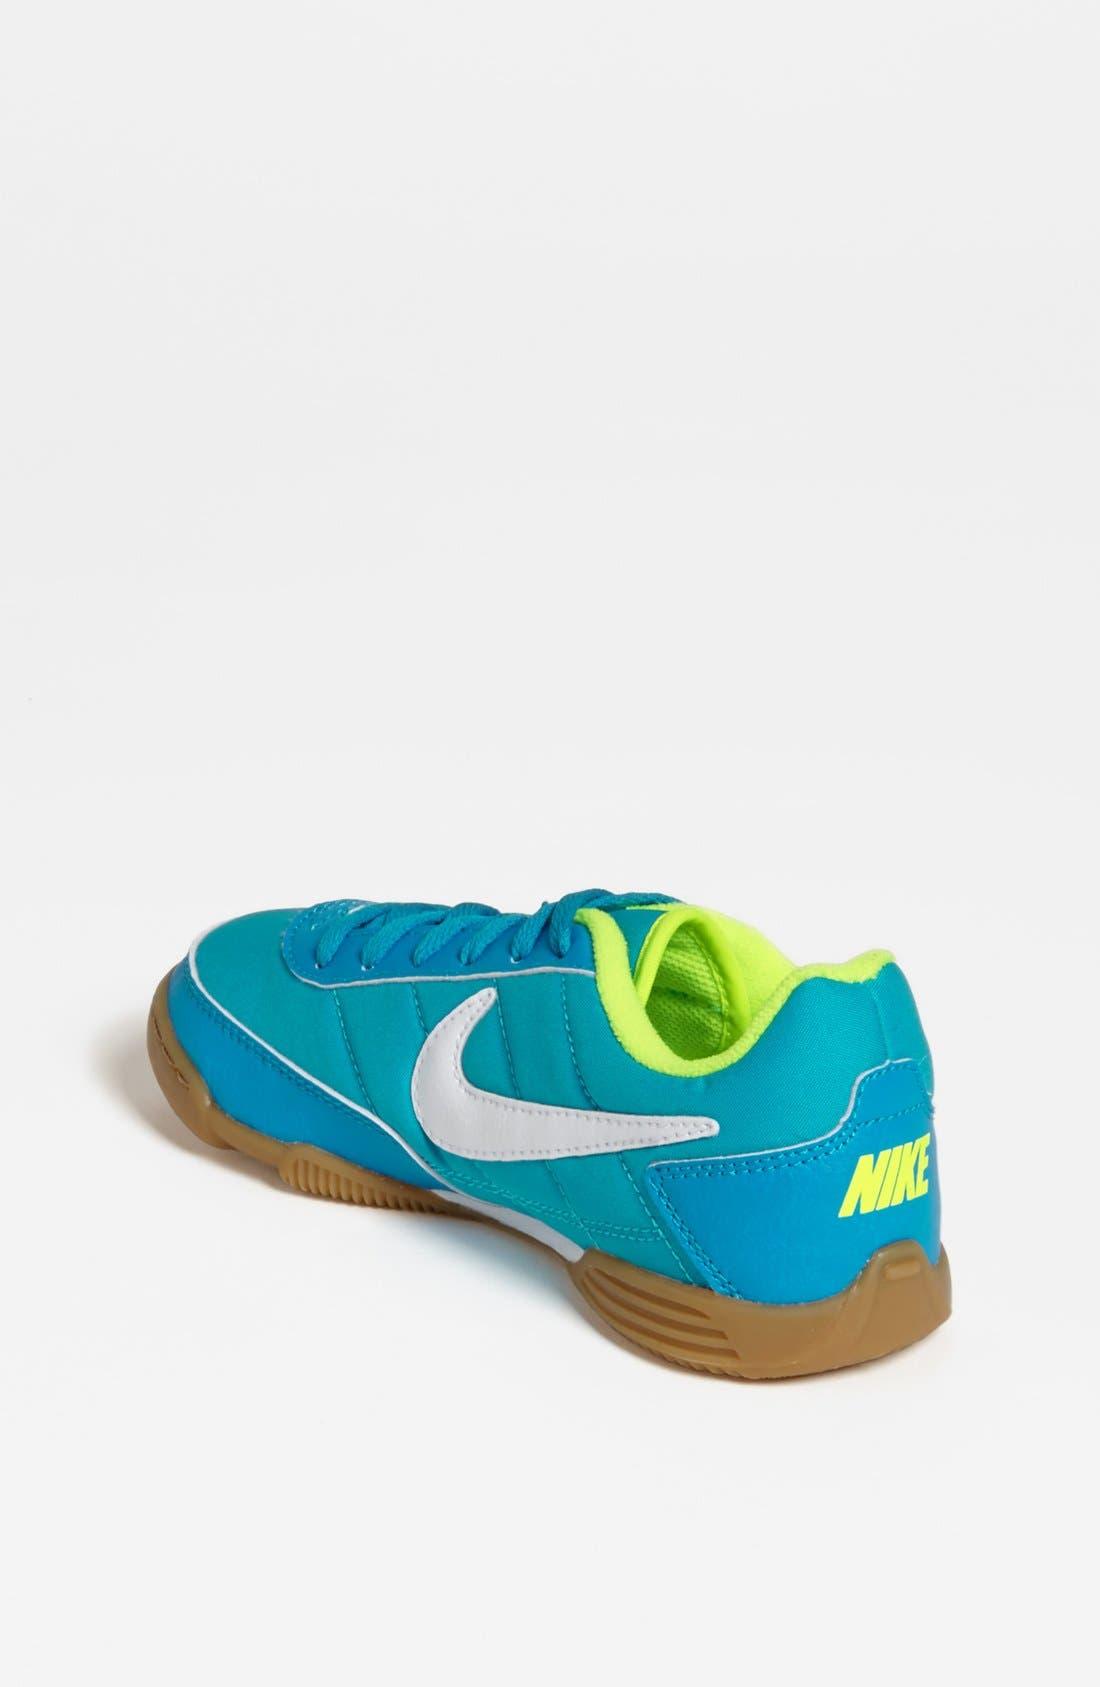 Alternate Image 2  - Nike 'JR Davinho' Soccer Cleat (Toddler, Little Kid & Big Kid)